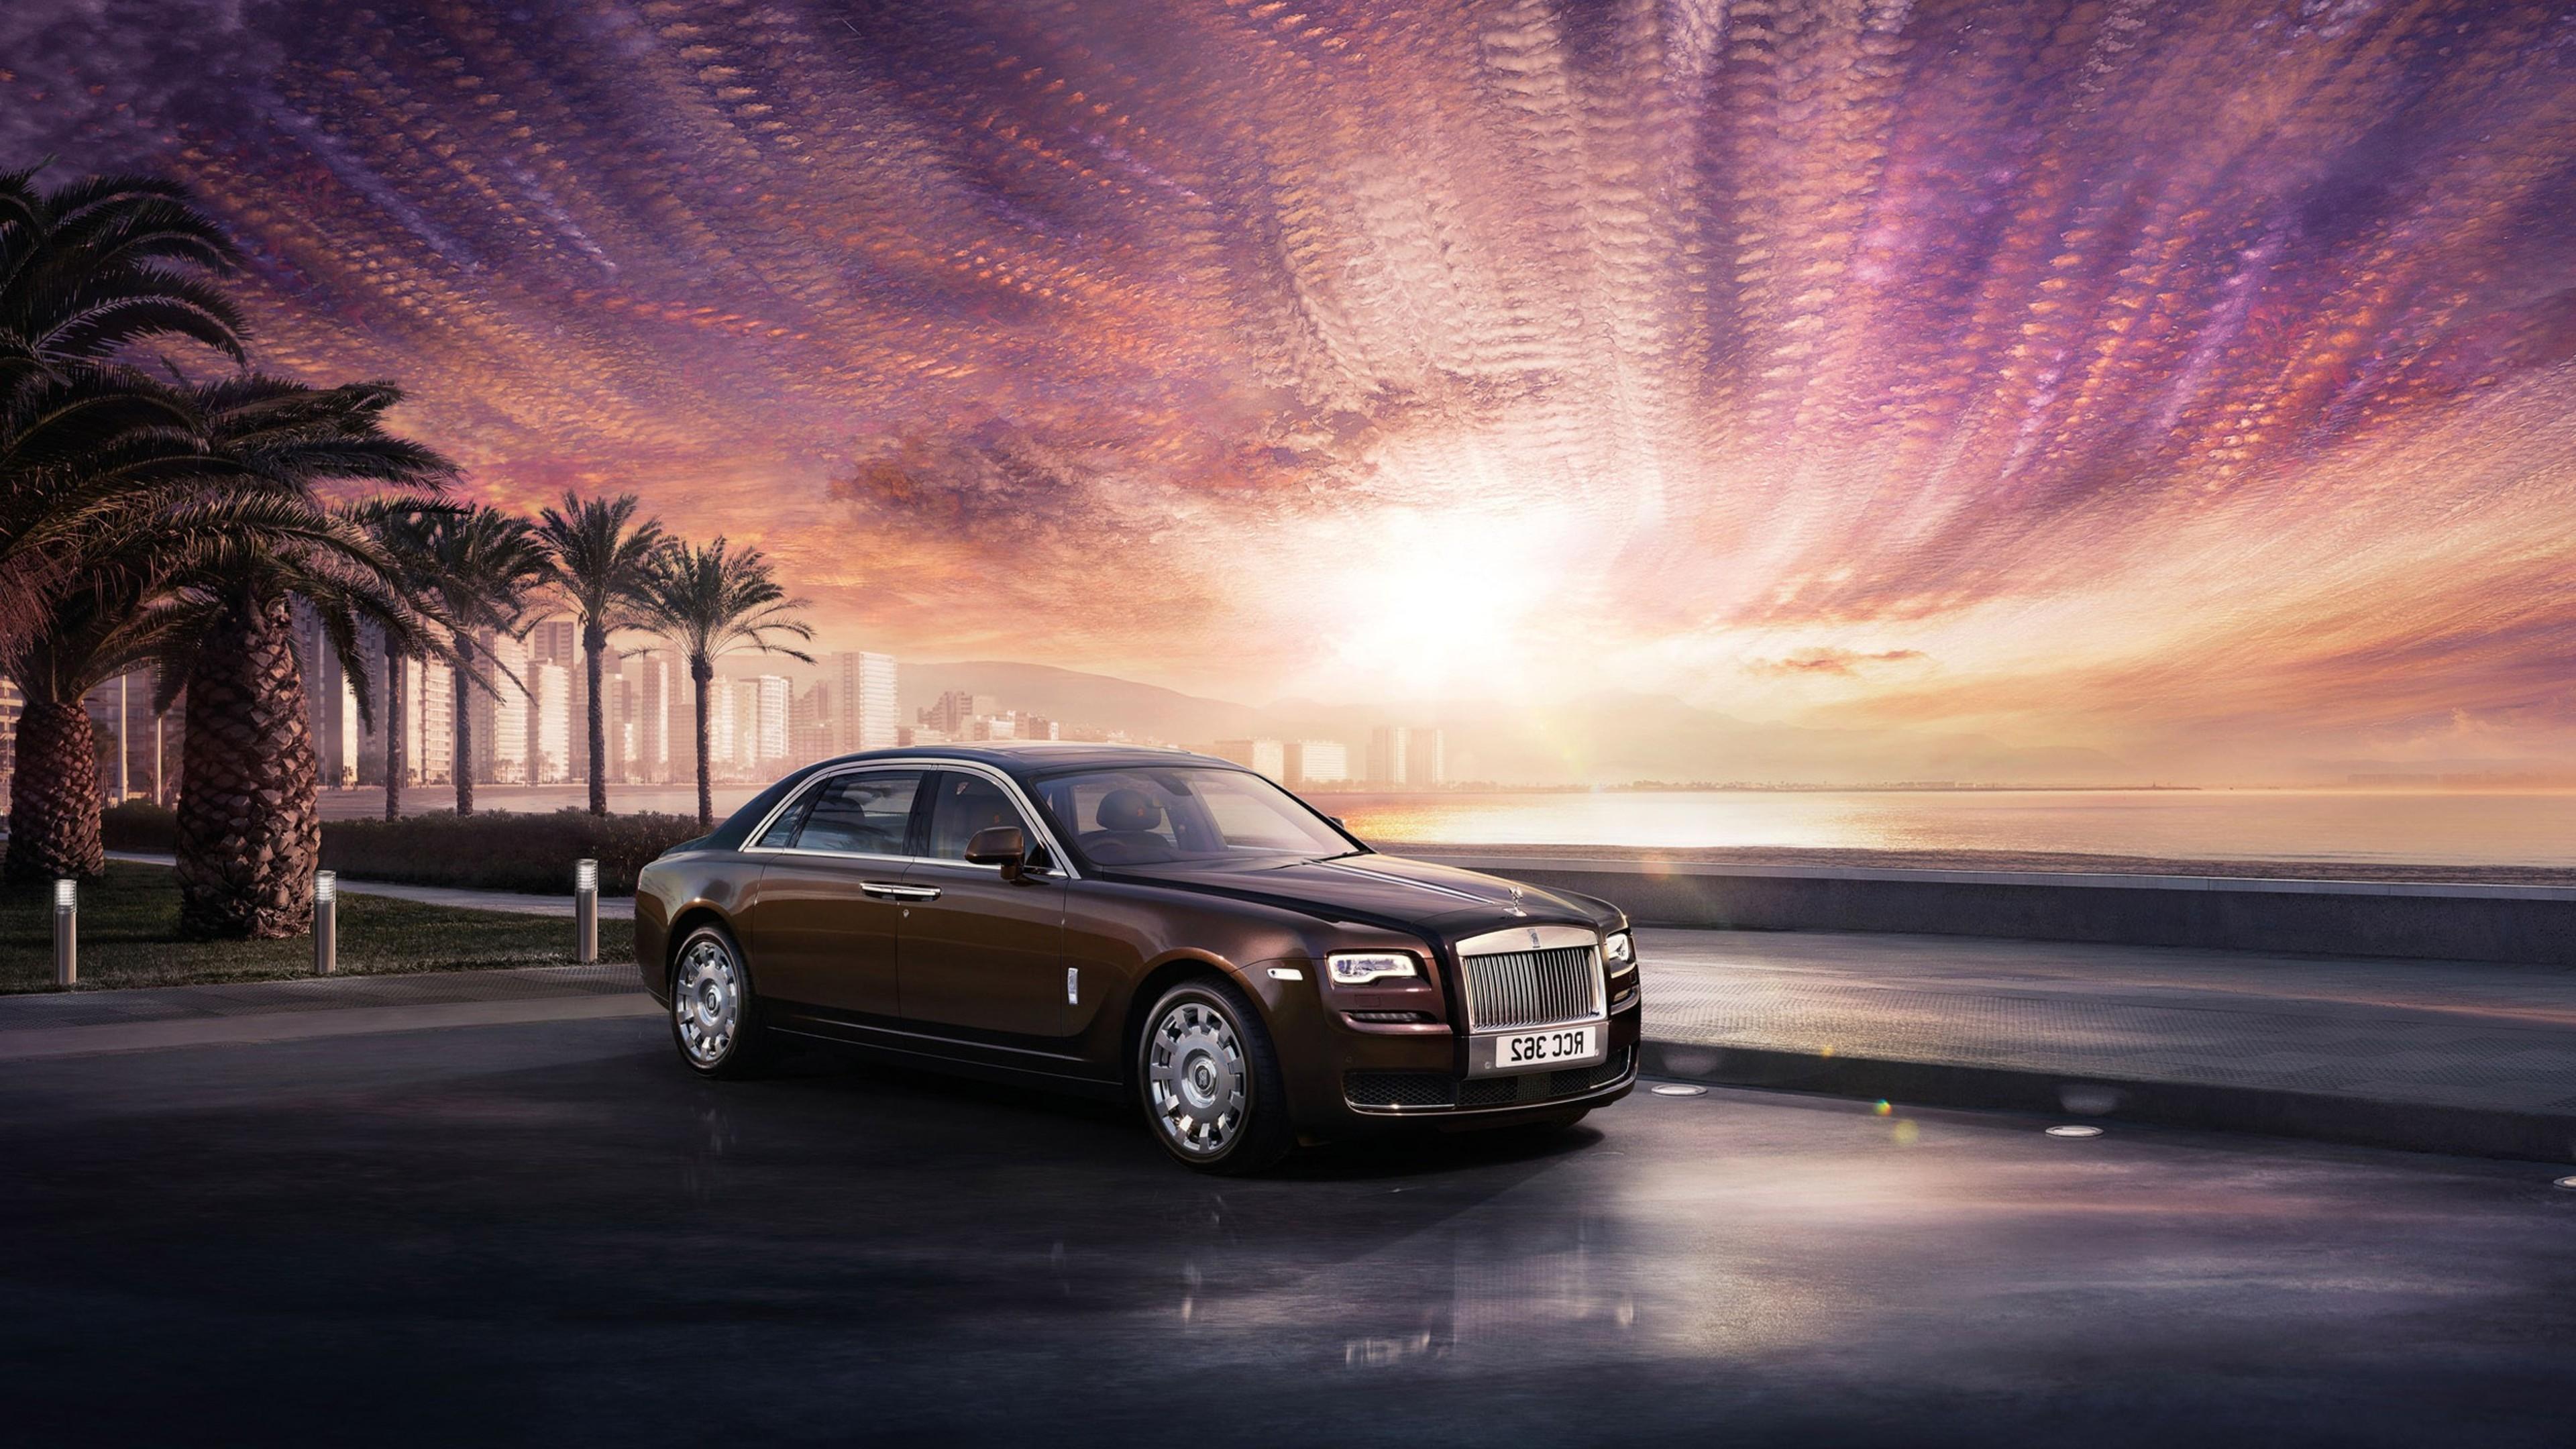 Rolls Royce Ghost Series 2016, HD Cars, 4k Wallpapers ...